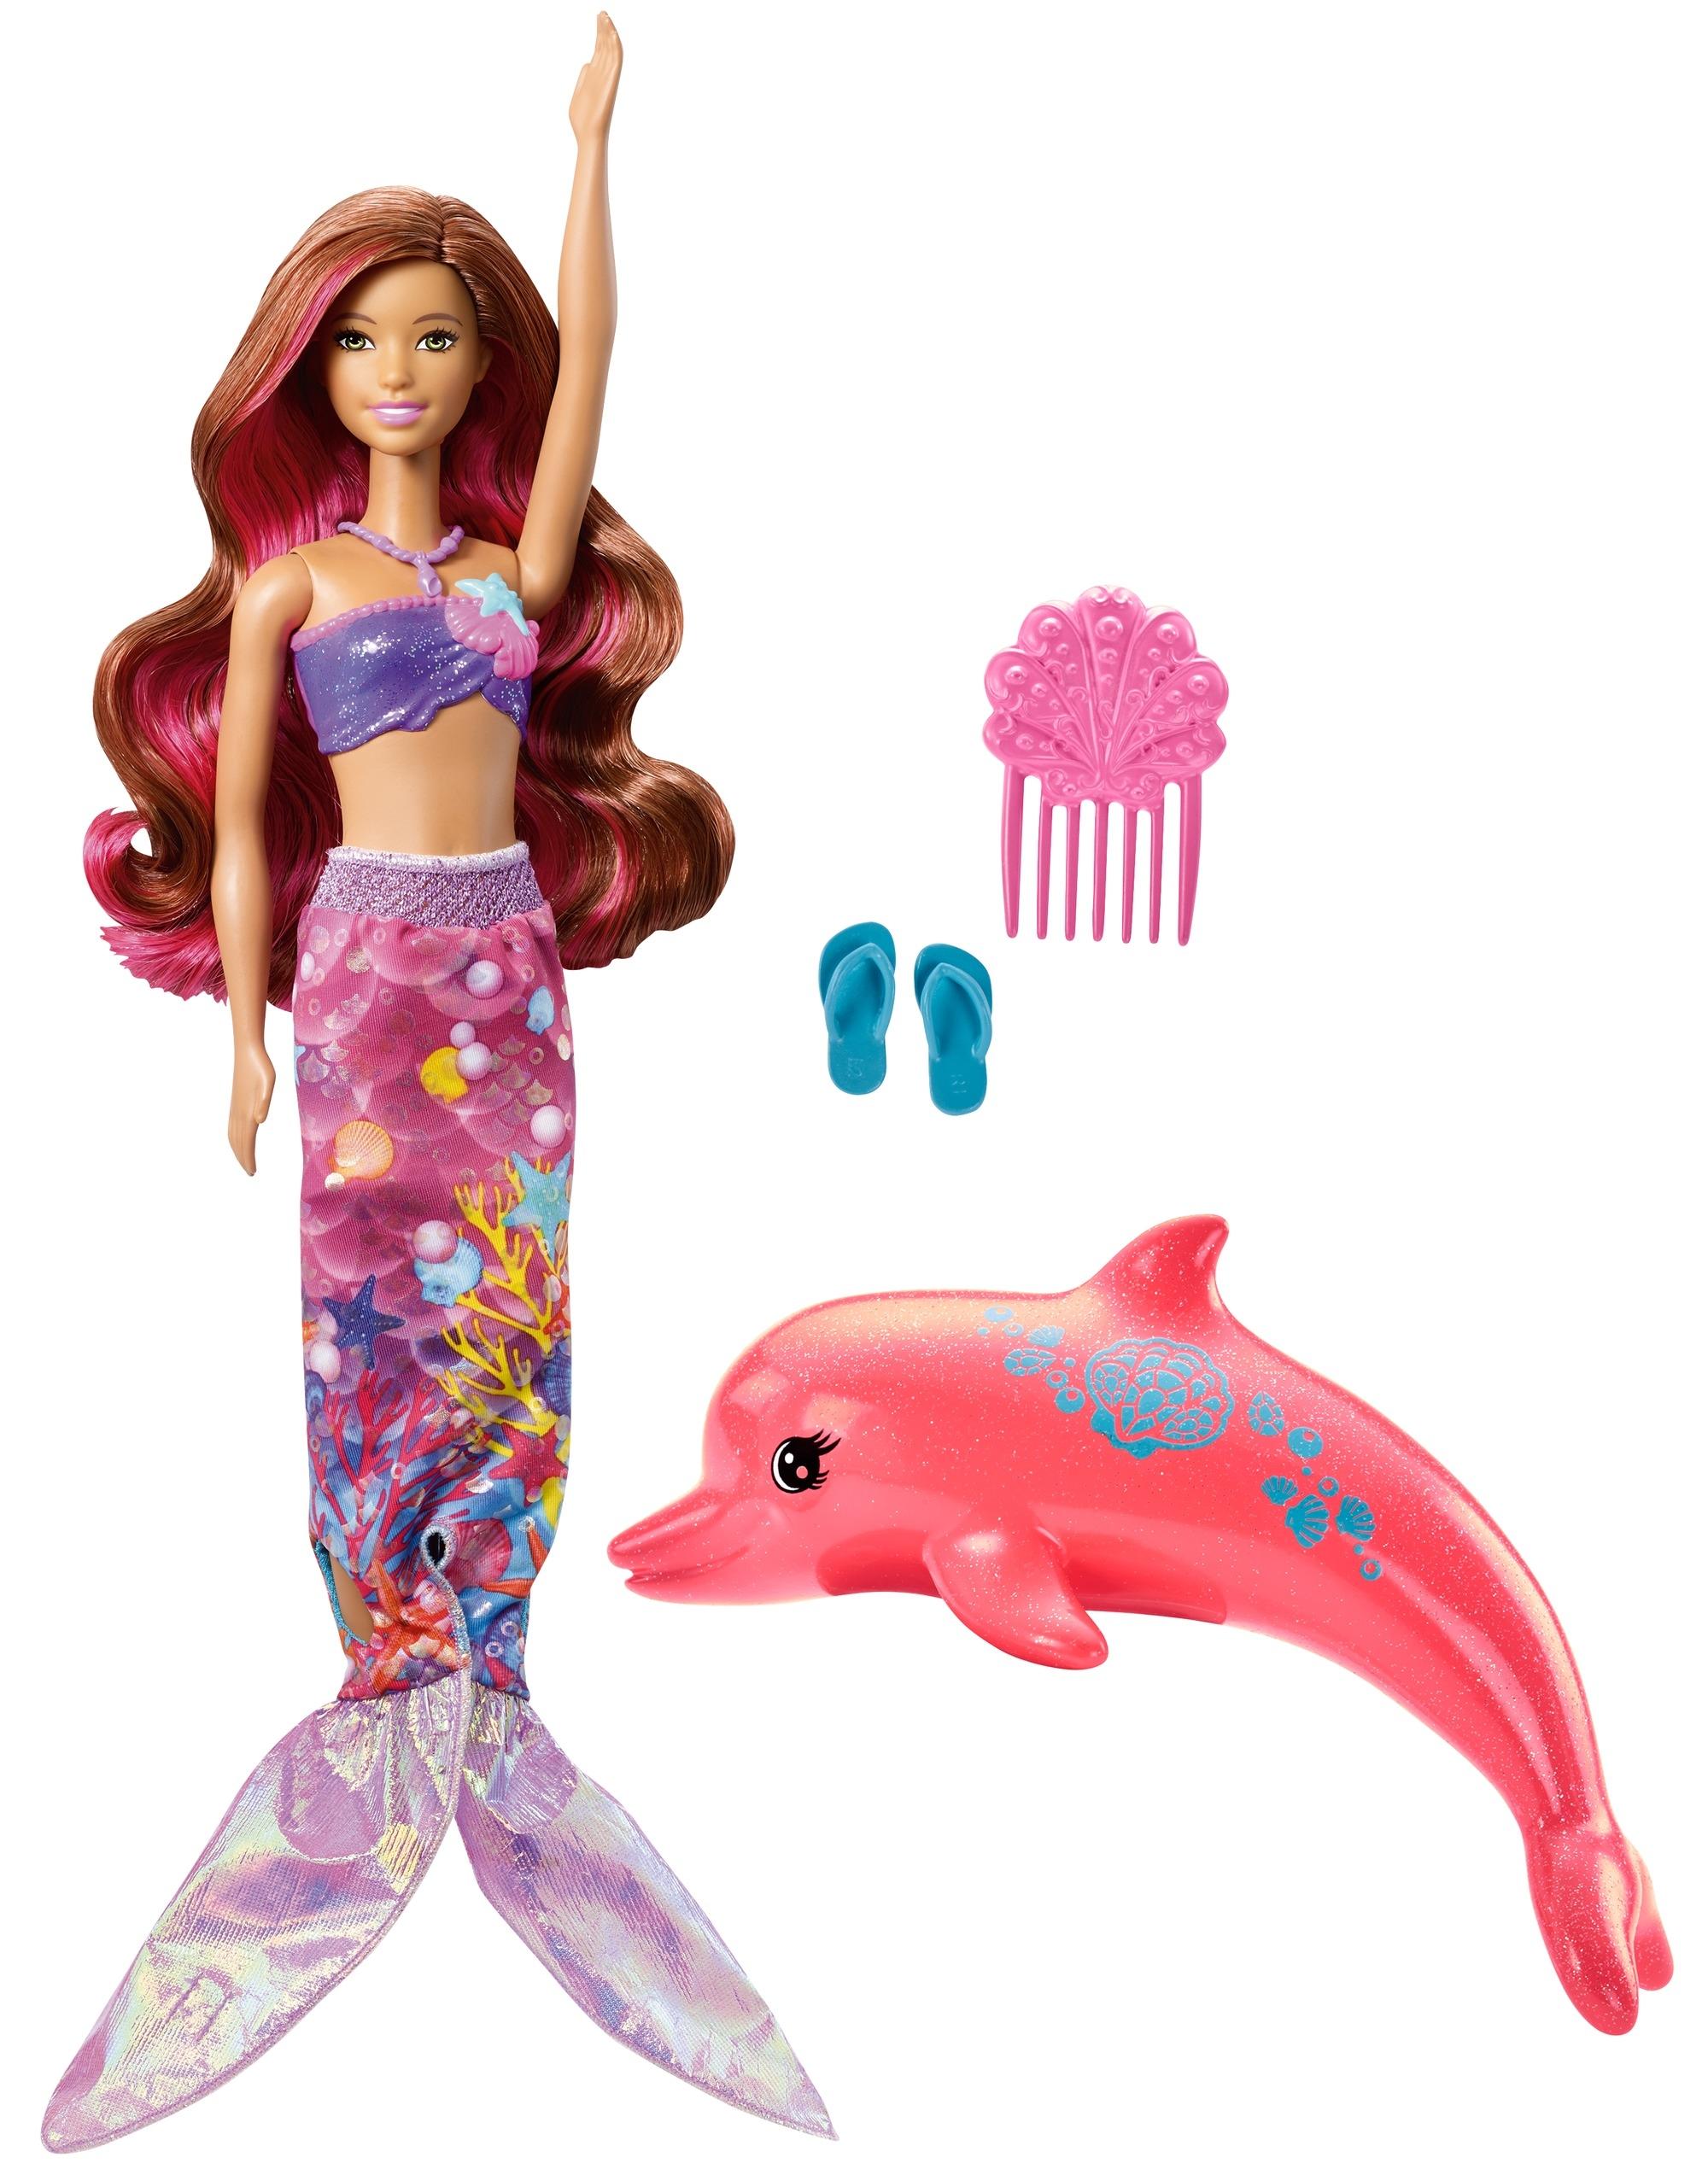 Barbie Barbie Кукла-трансформер Barbie «Морские приключения» кукла морские приключения barbie fbd73